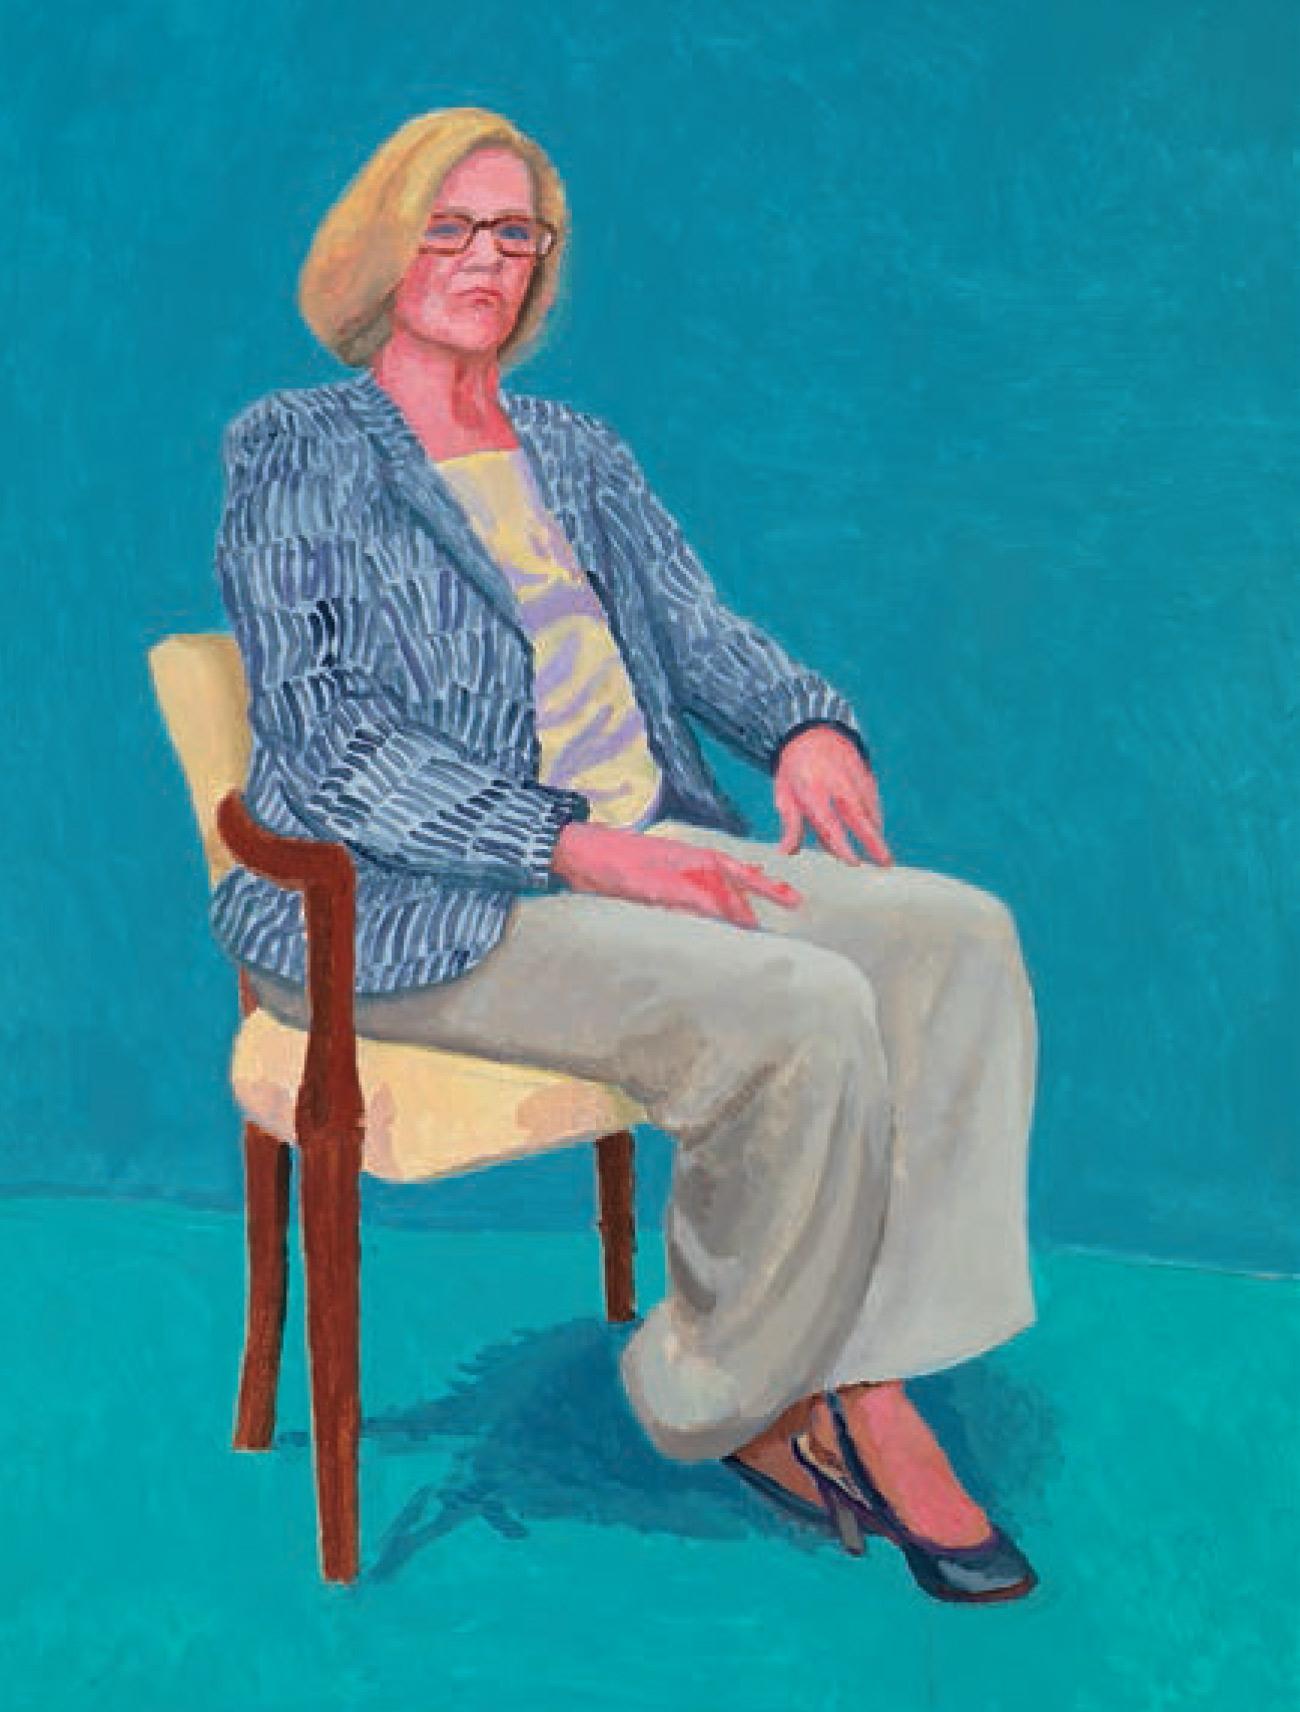 Cat. 22Dagny Corcoran, 15th, 16th, 17th January 2014, Acrylic on Canvas, 121.9 × 91.4cm